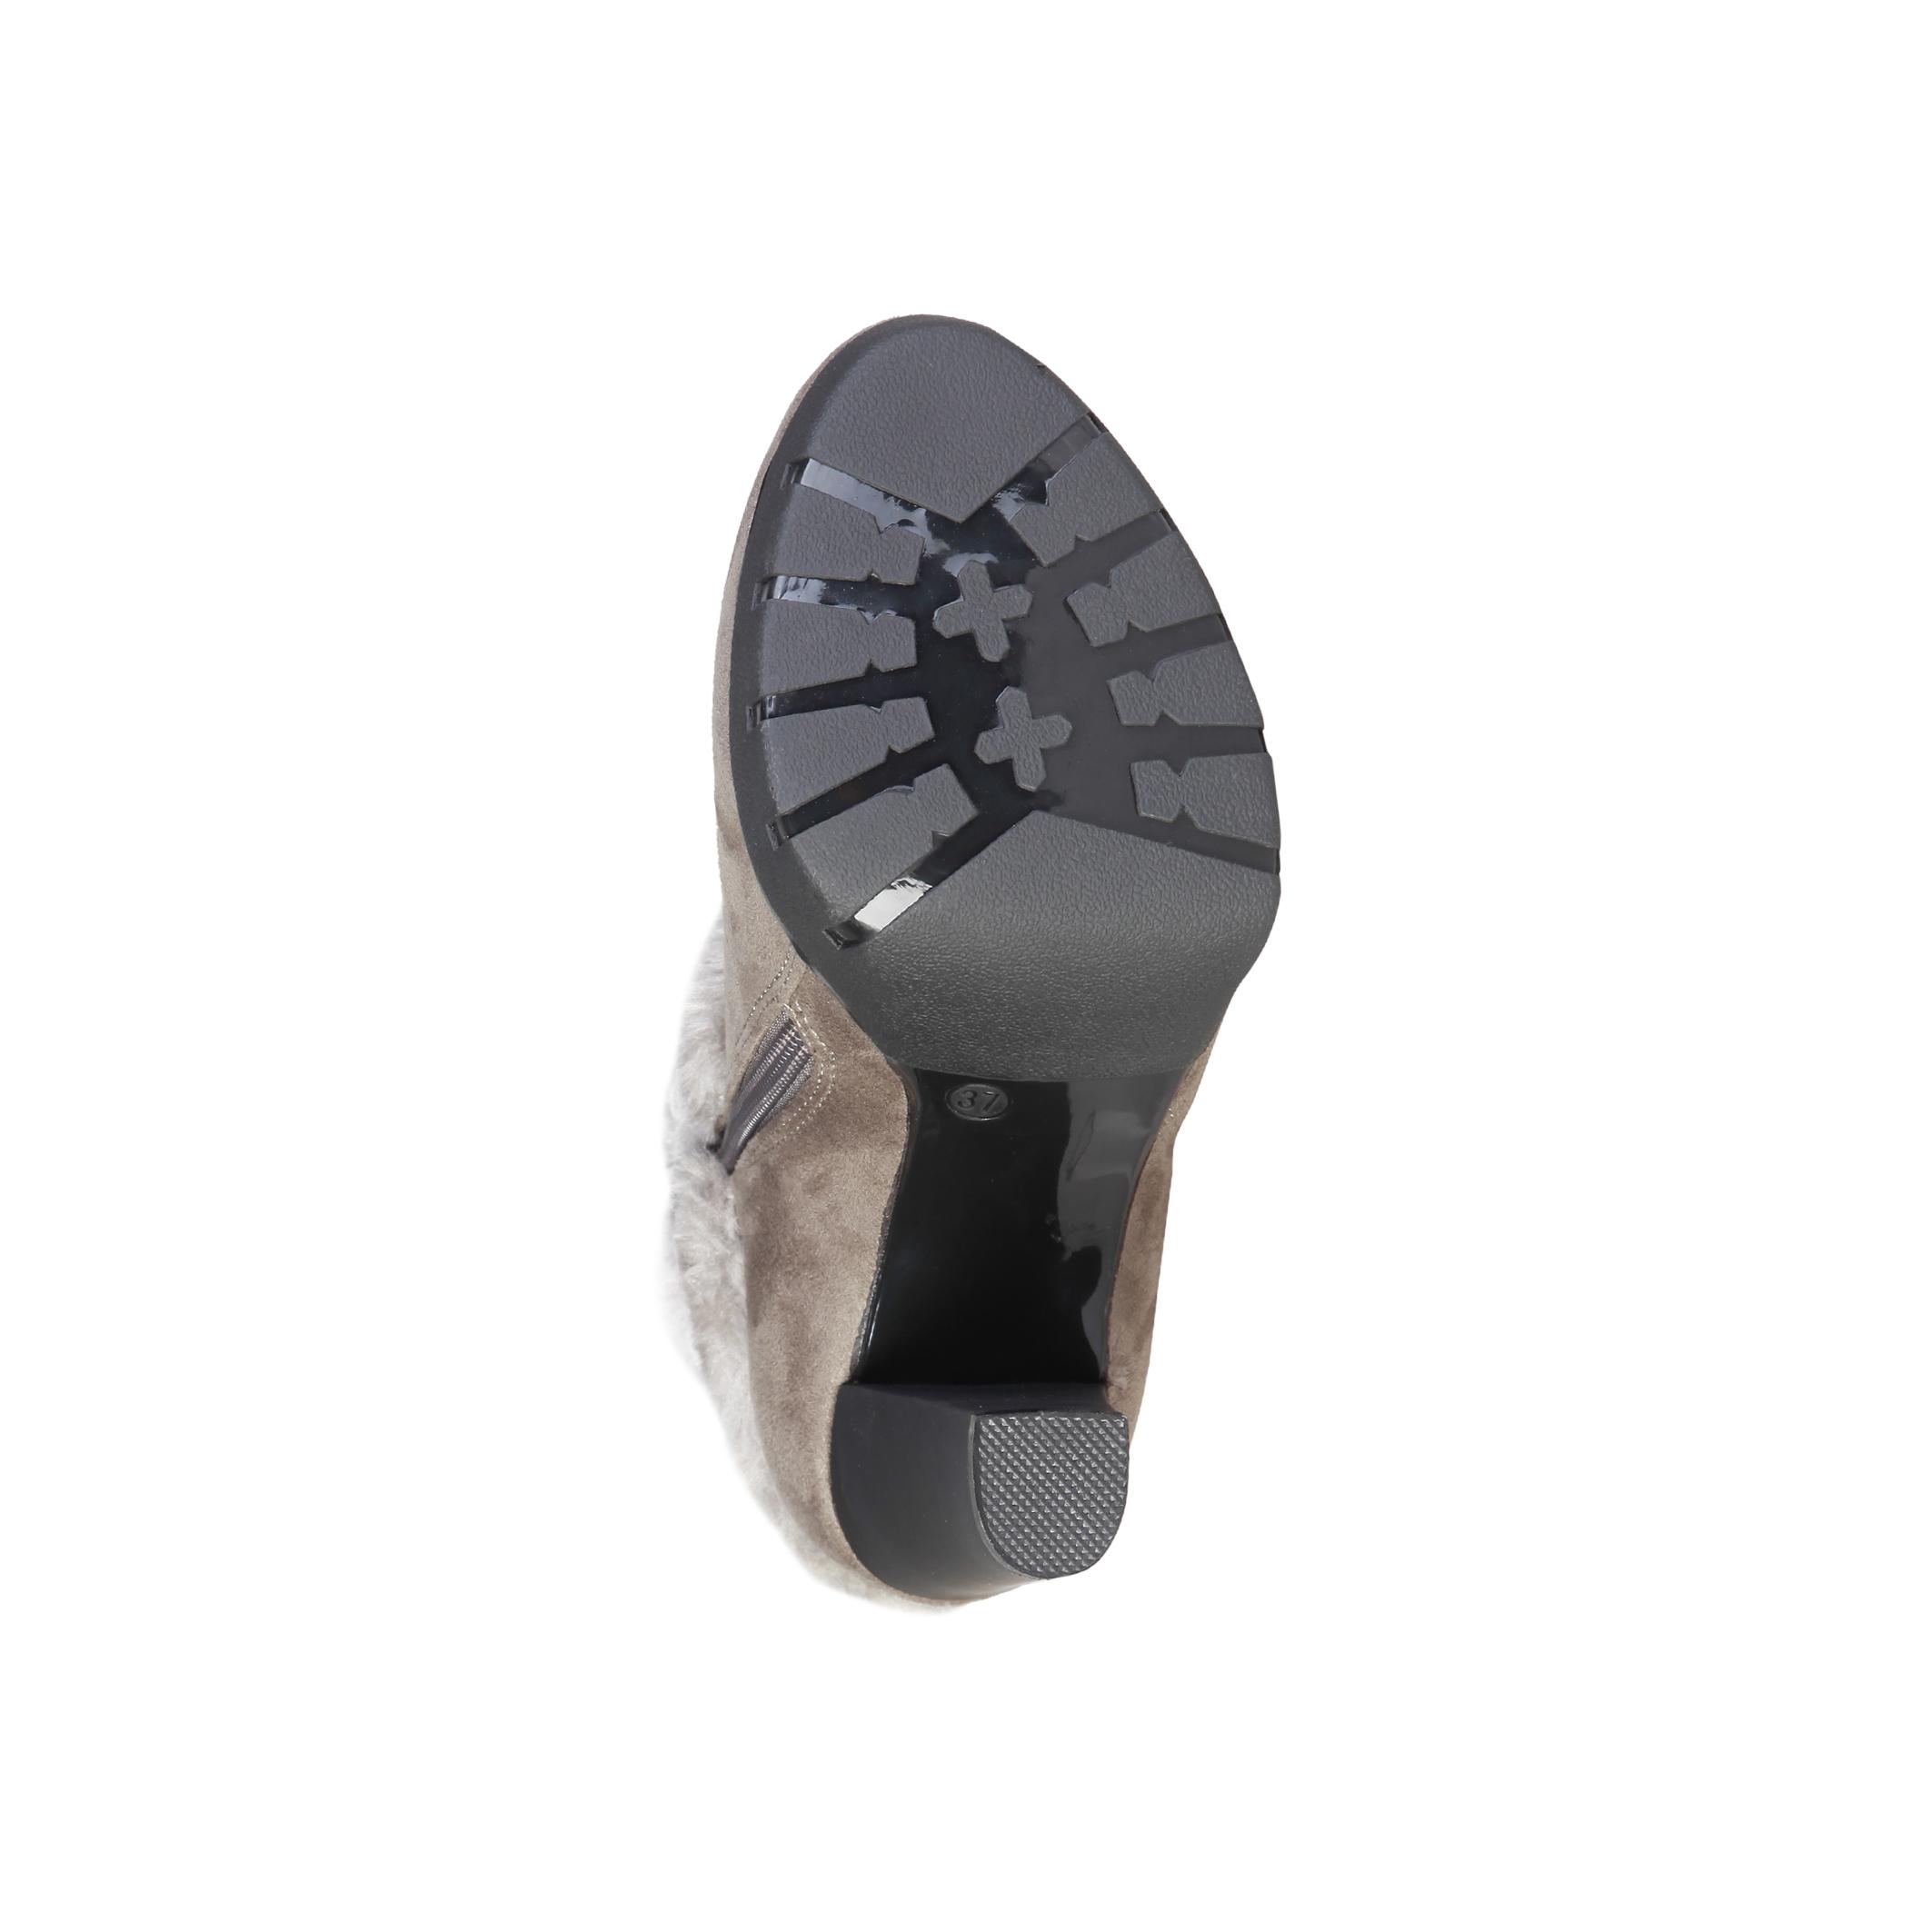 Chaussures de ville  Laura Biagiotti 2111 brown